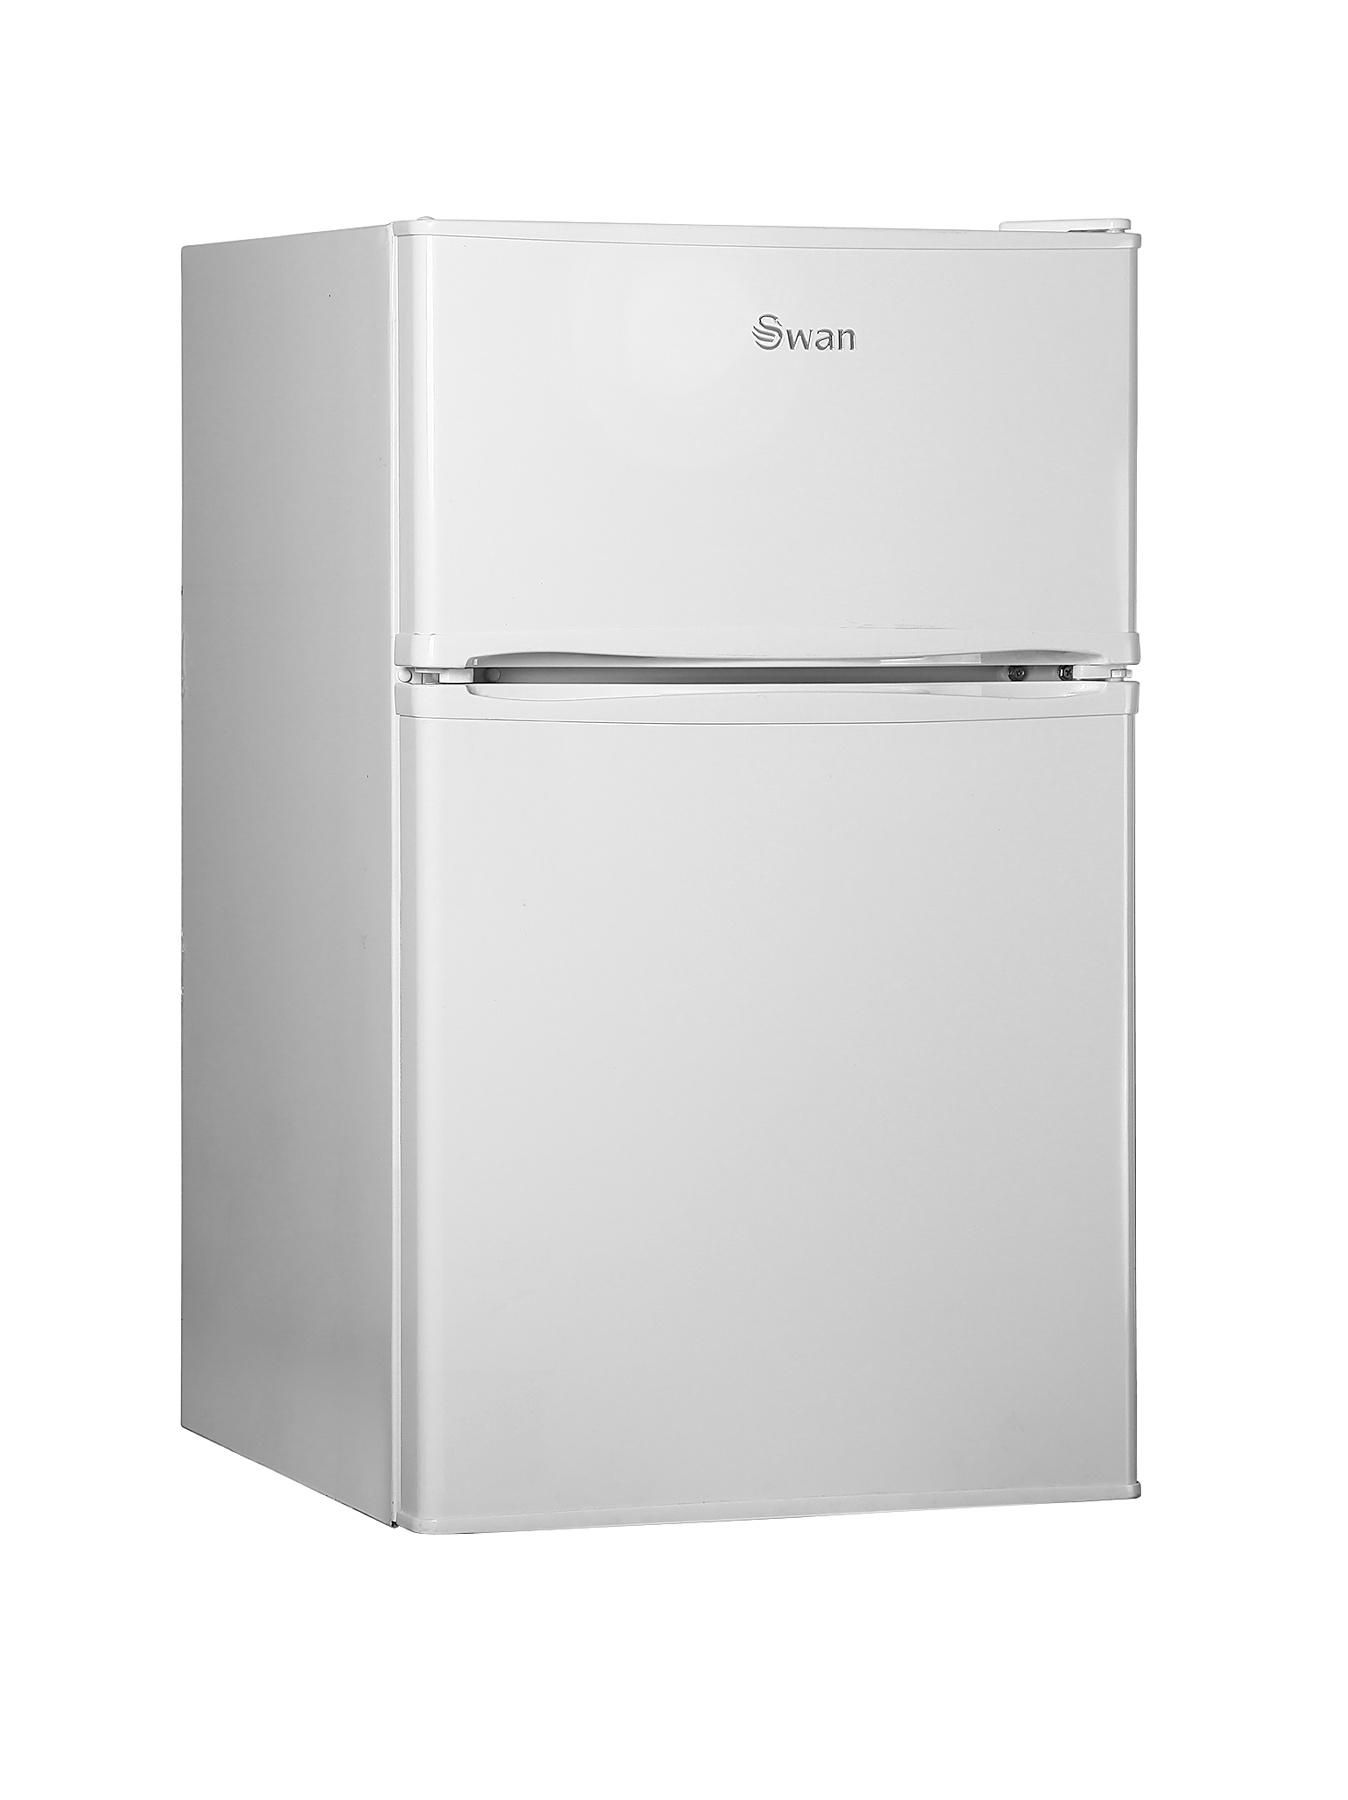 Swan SR5370W 49 5cm Undercounter Fridge Freezer White